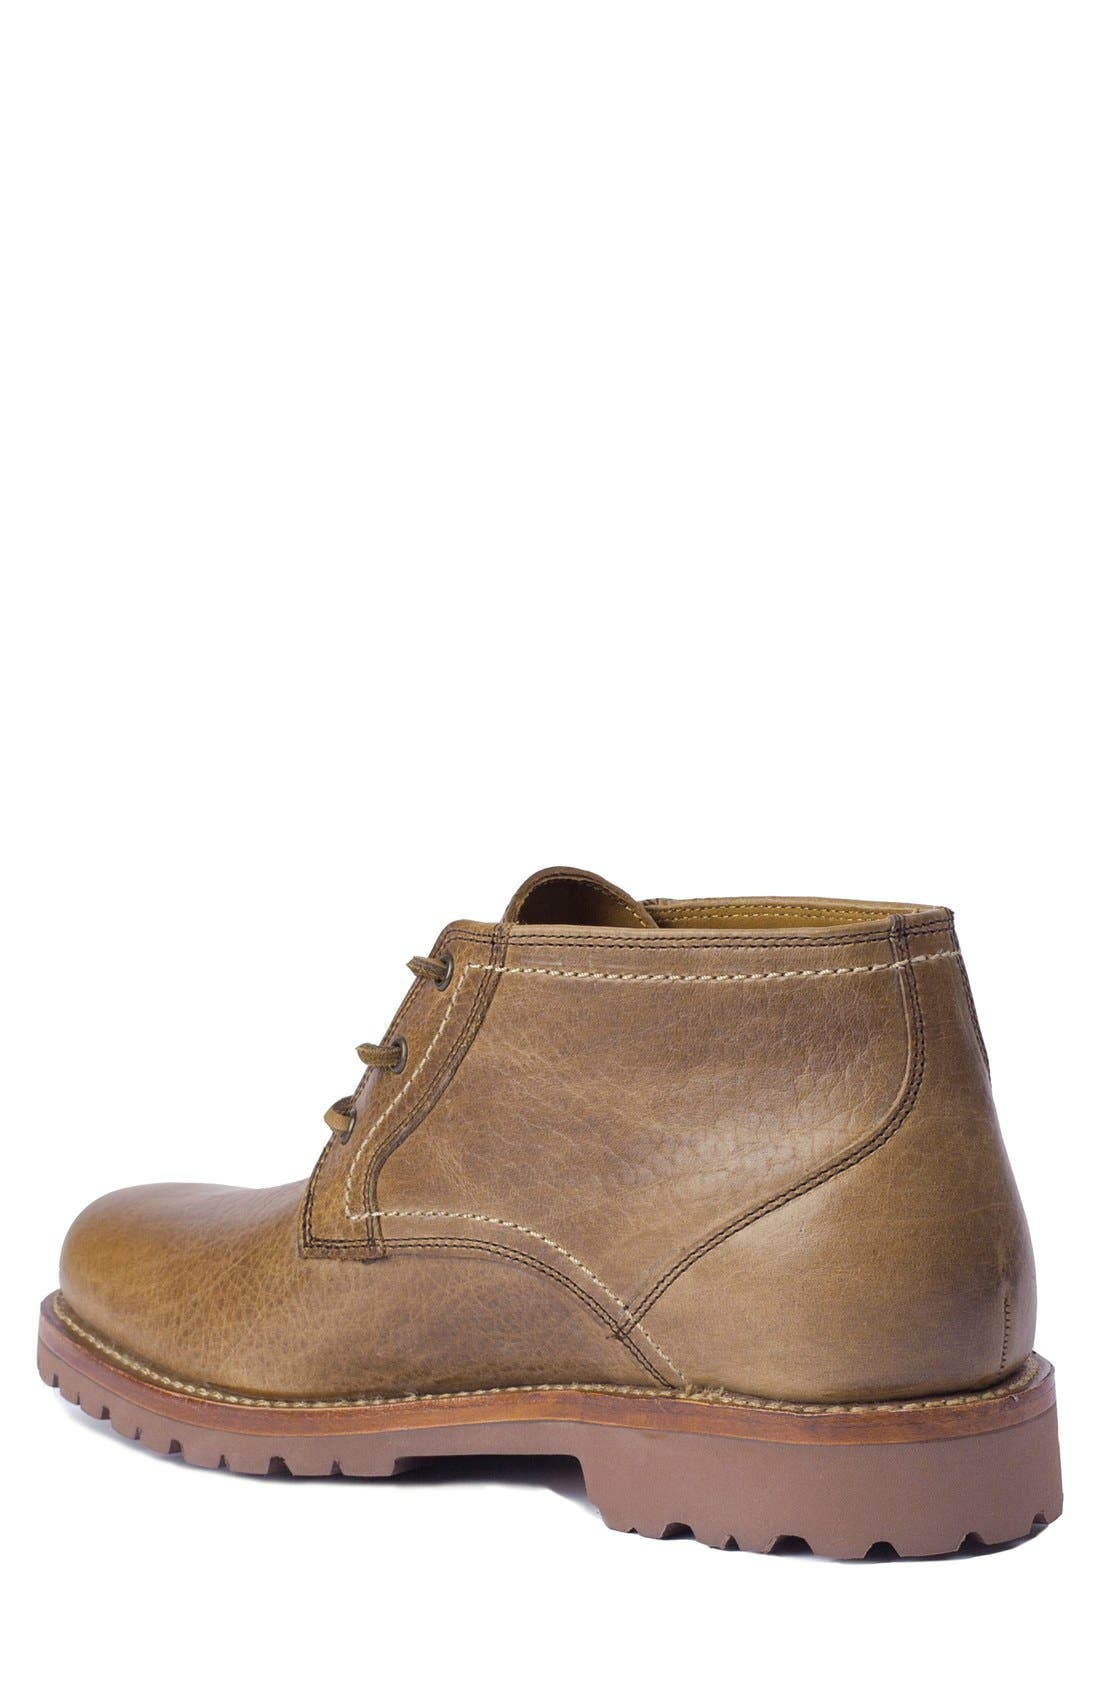 'Bighorn' Plain Toe Boot,                             Alternate thumbnail 6, color,